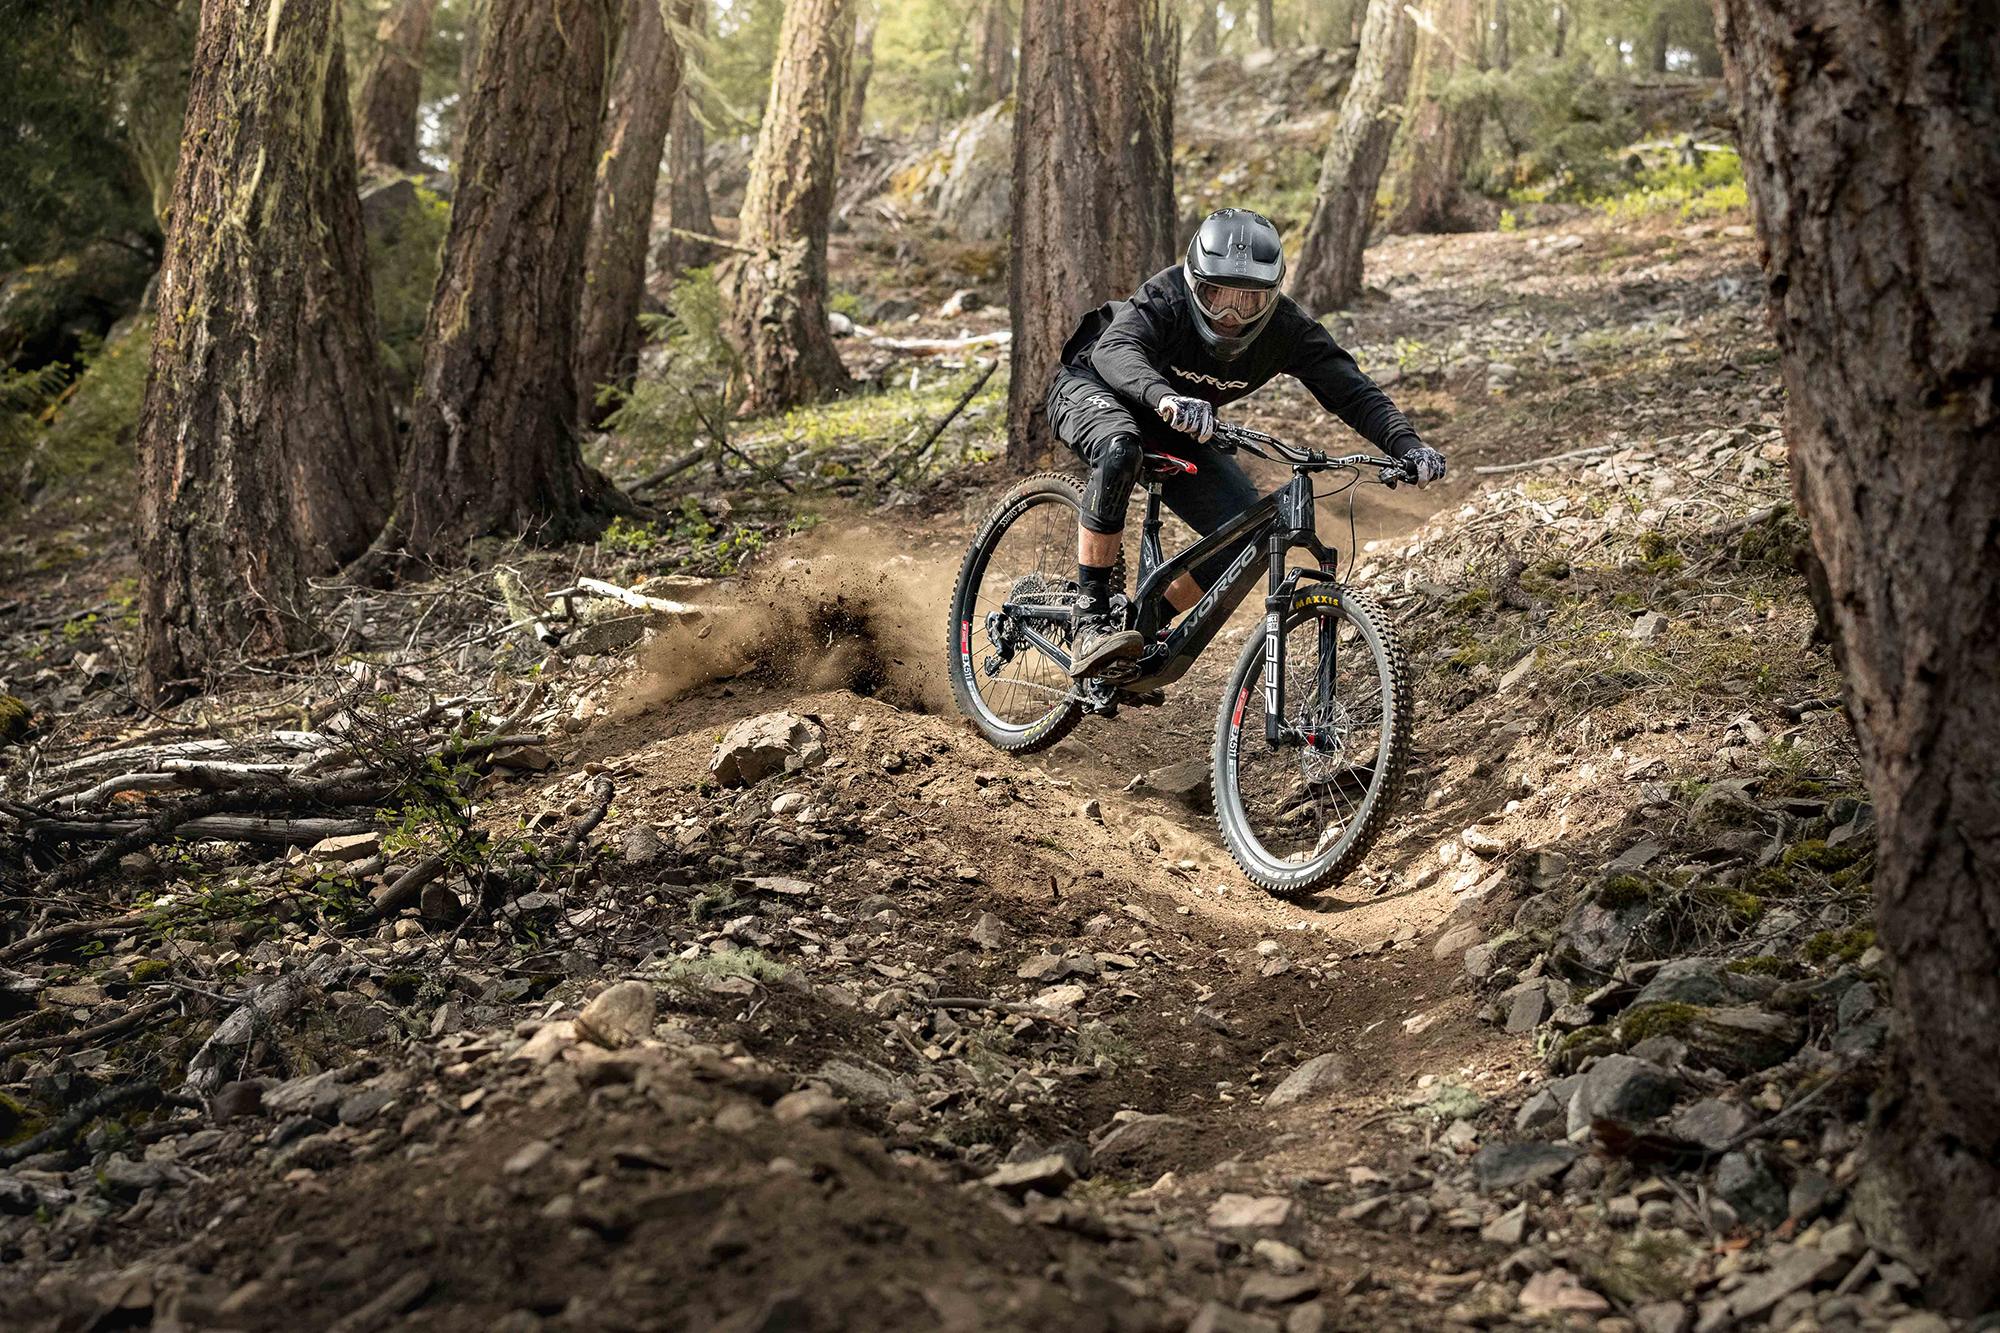 png riding 7 photo robin oneill Cycleholix